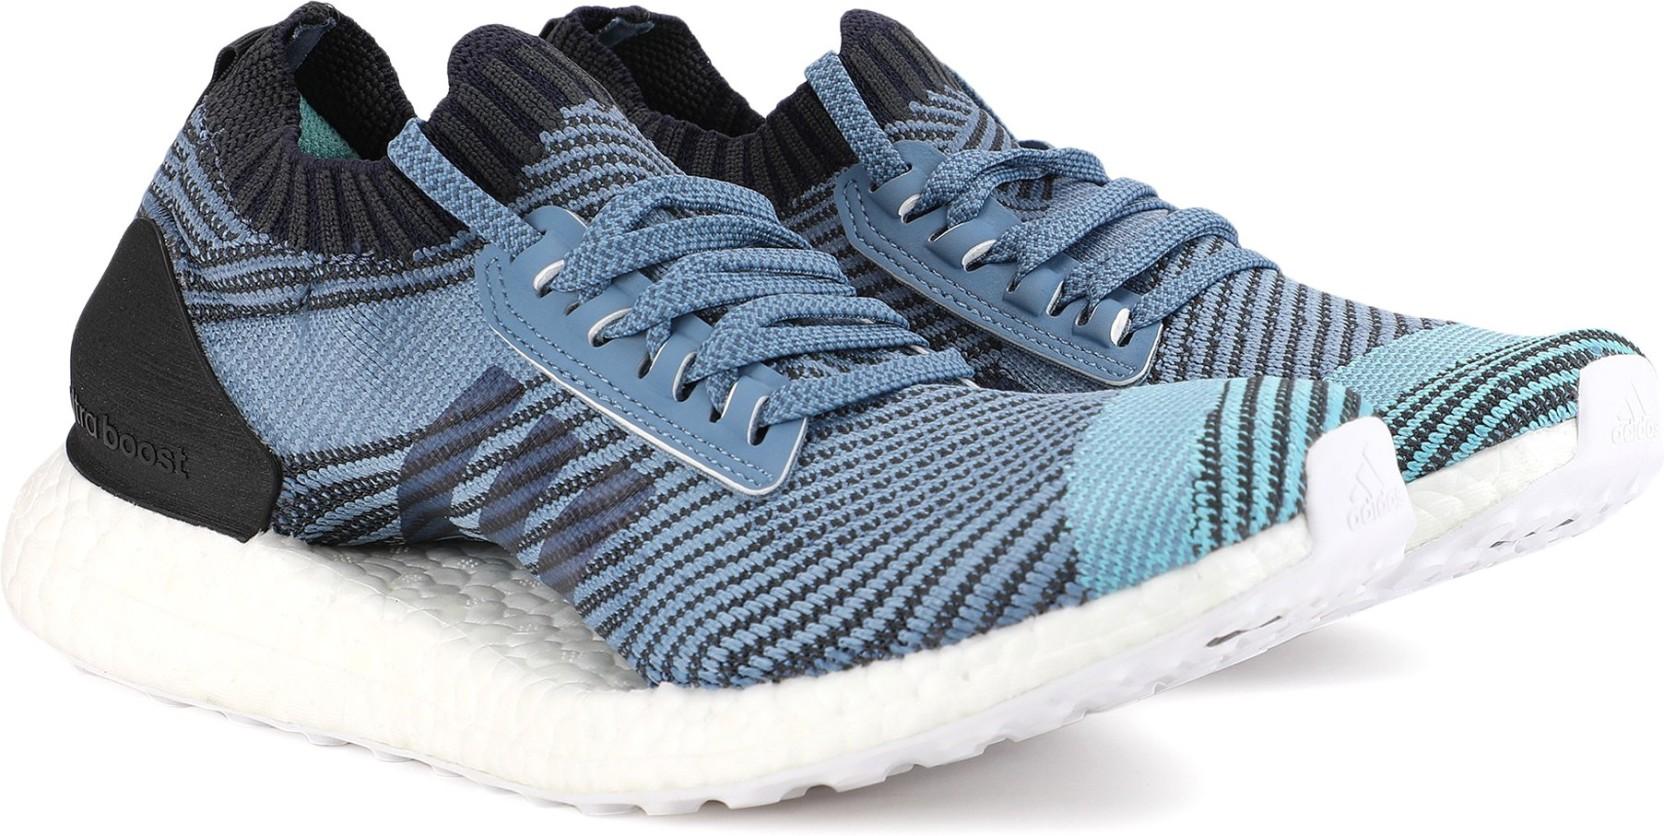 3d8b55533515c ADIDAS ULTRABOOST X PARLEY Running Shoes For Women - Buy RAWGRE ...